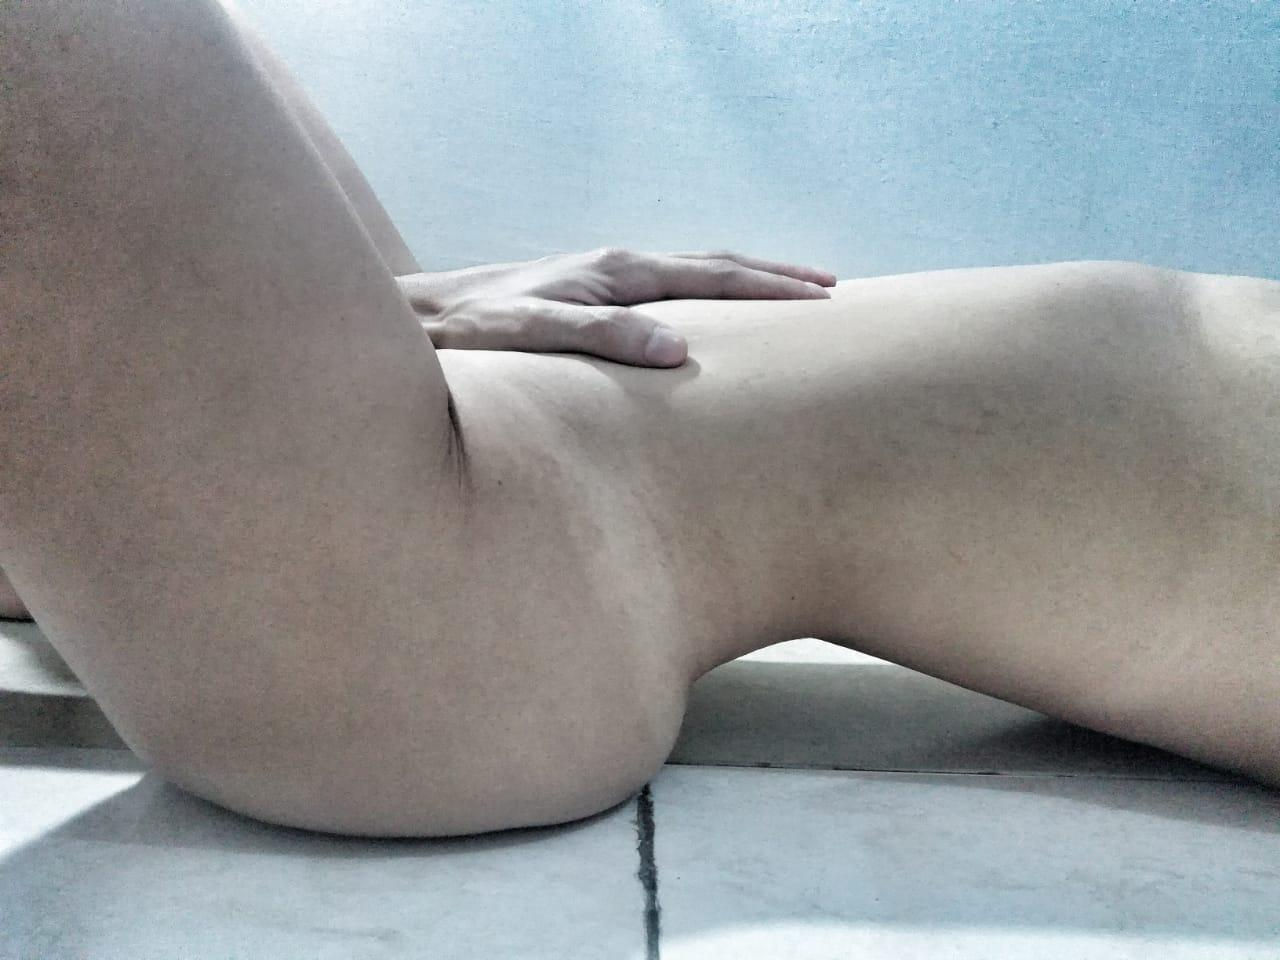 Sex horny?s=0yotgraczjz9vk6odo+oxqkfgmgx3nsggjl4nyzwb40=